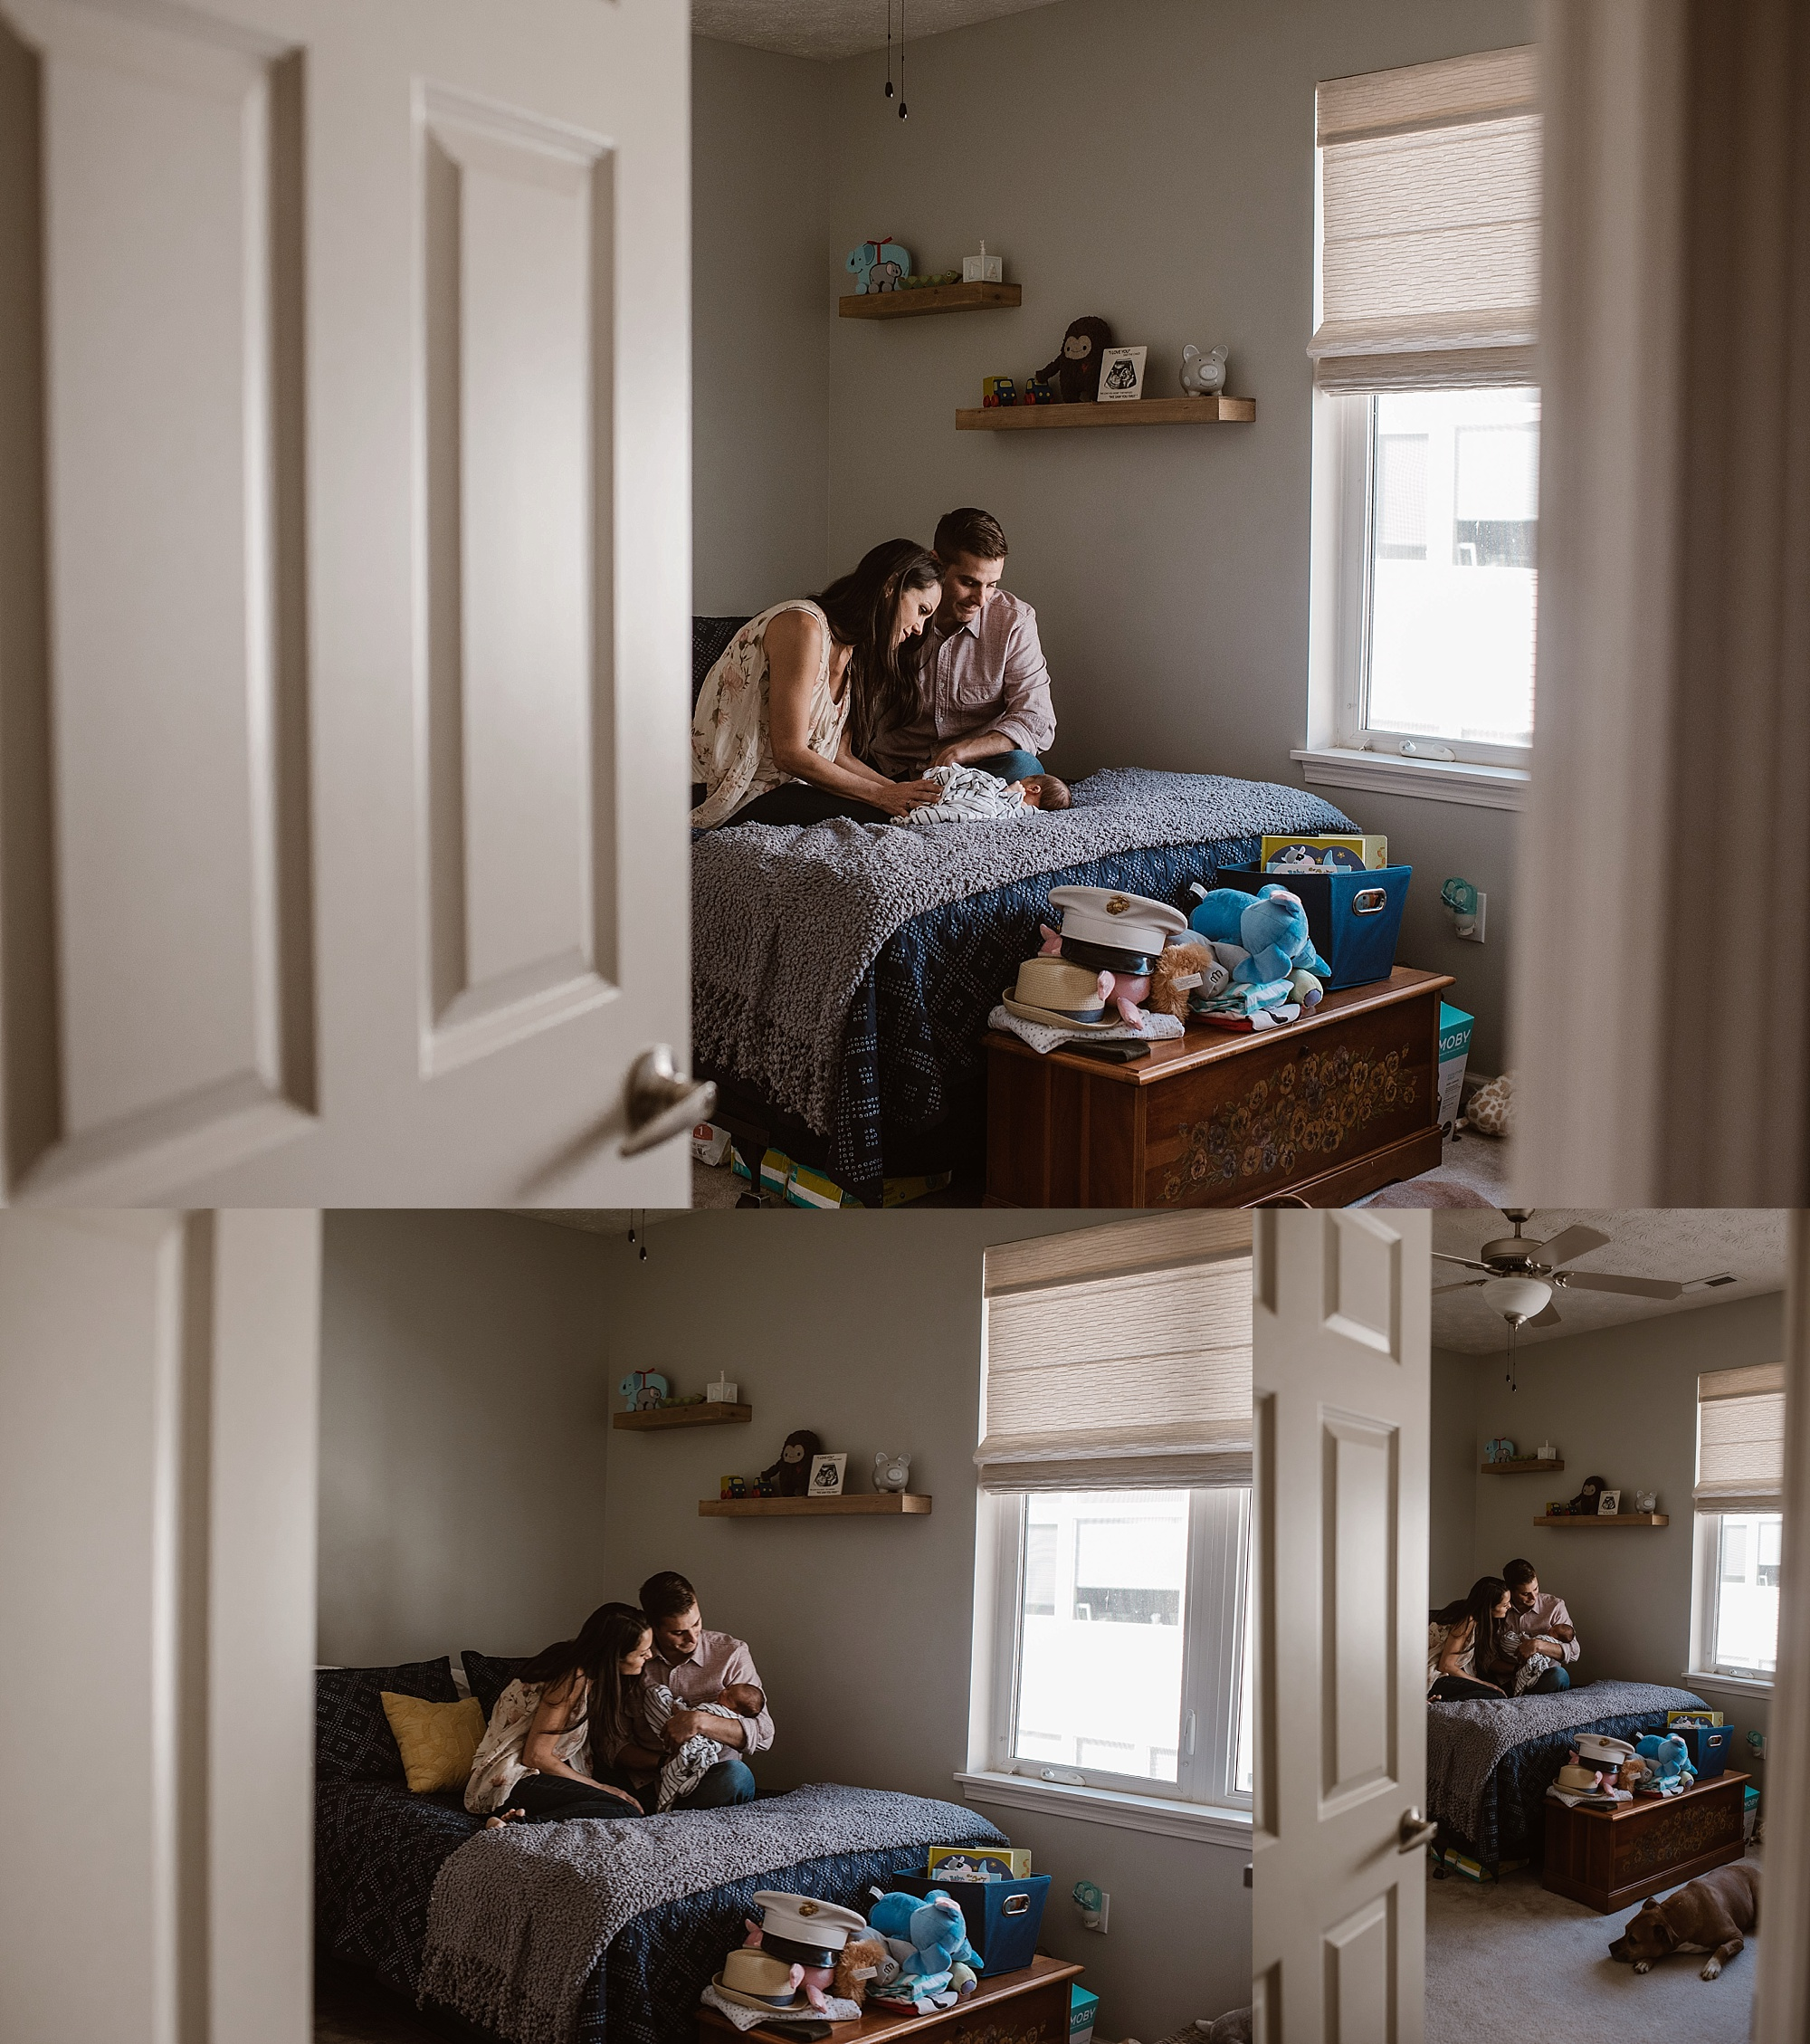 Welcome-baby-Cullin-akron-ohio-photographer-lauren-grayson-newborn-session_0037.jpg